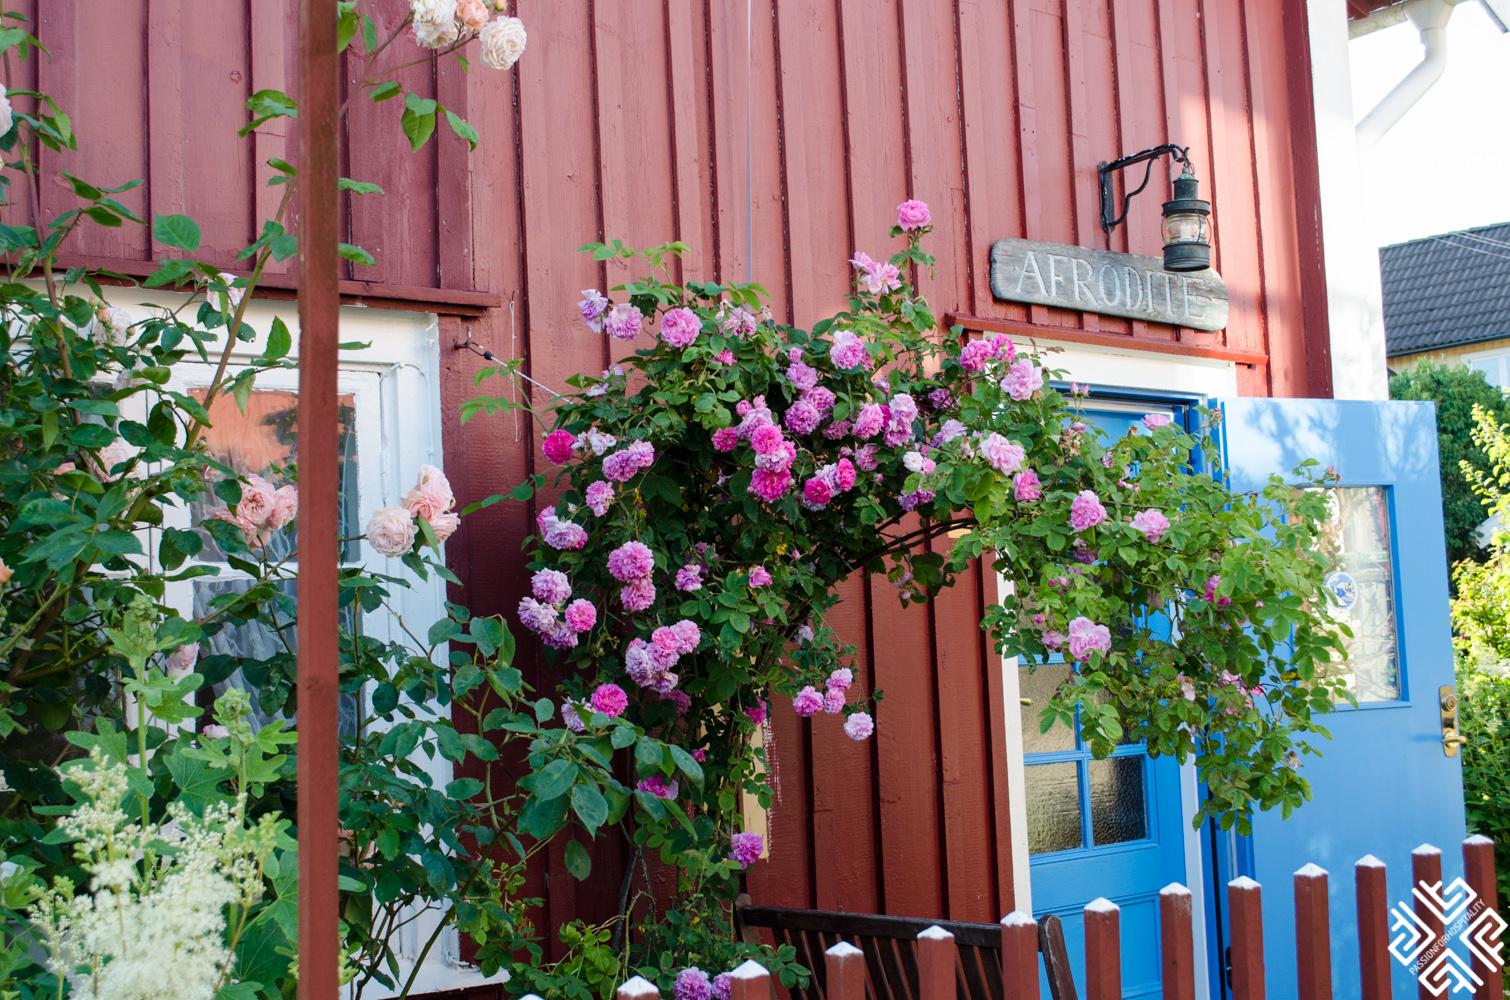 stockholm_archipelago_sandhamn-19